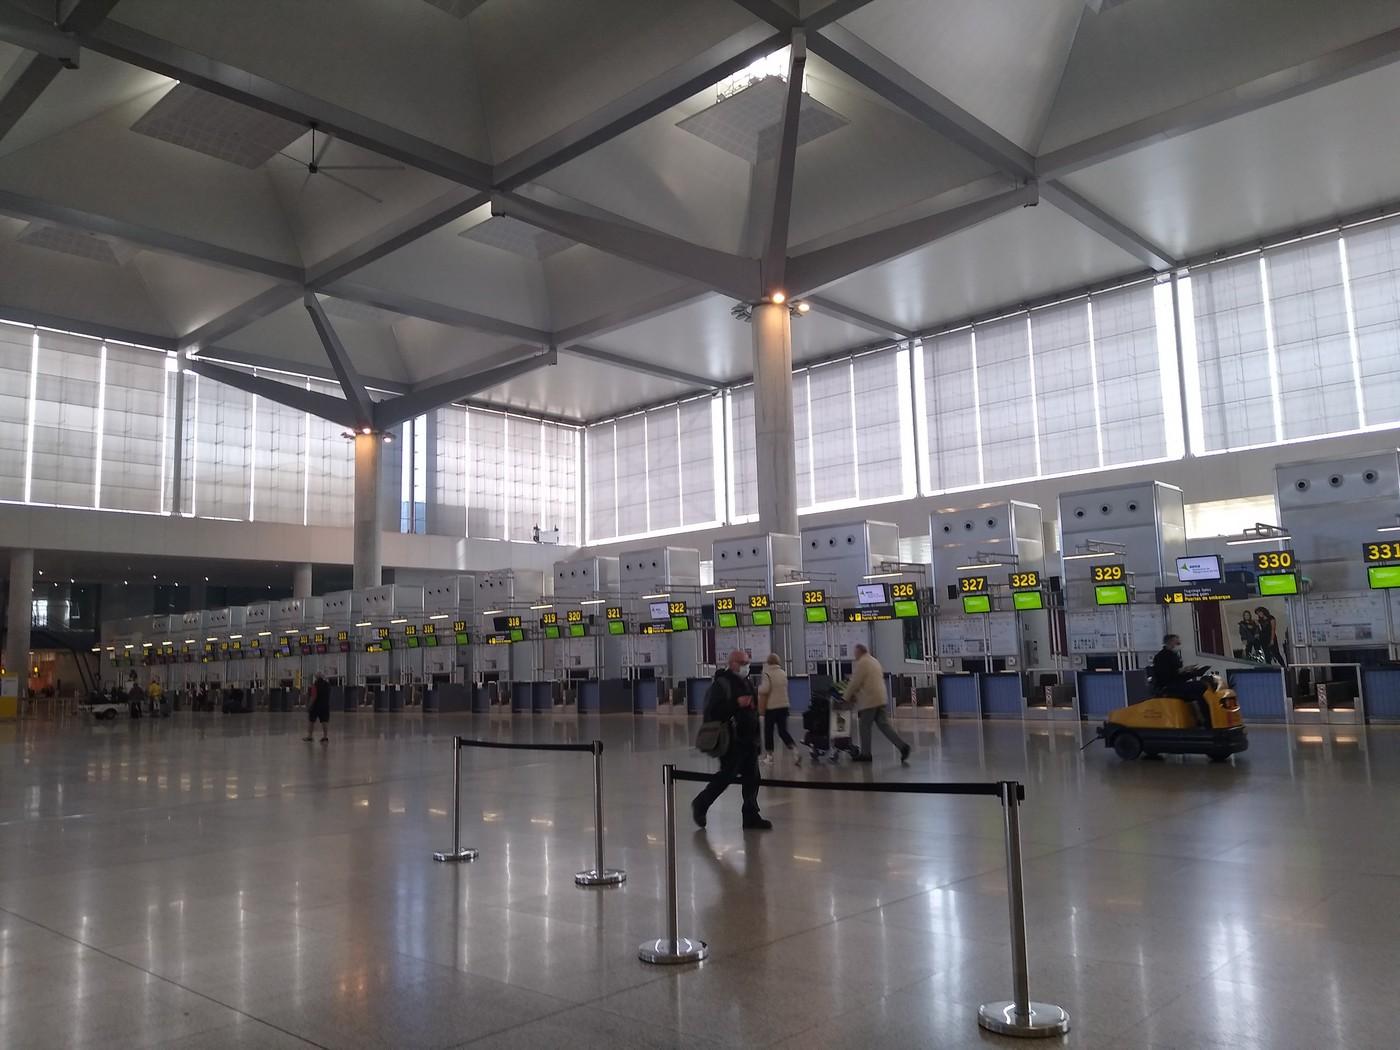 007-Airport-Lockdown-by-Madeleine-Lehane